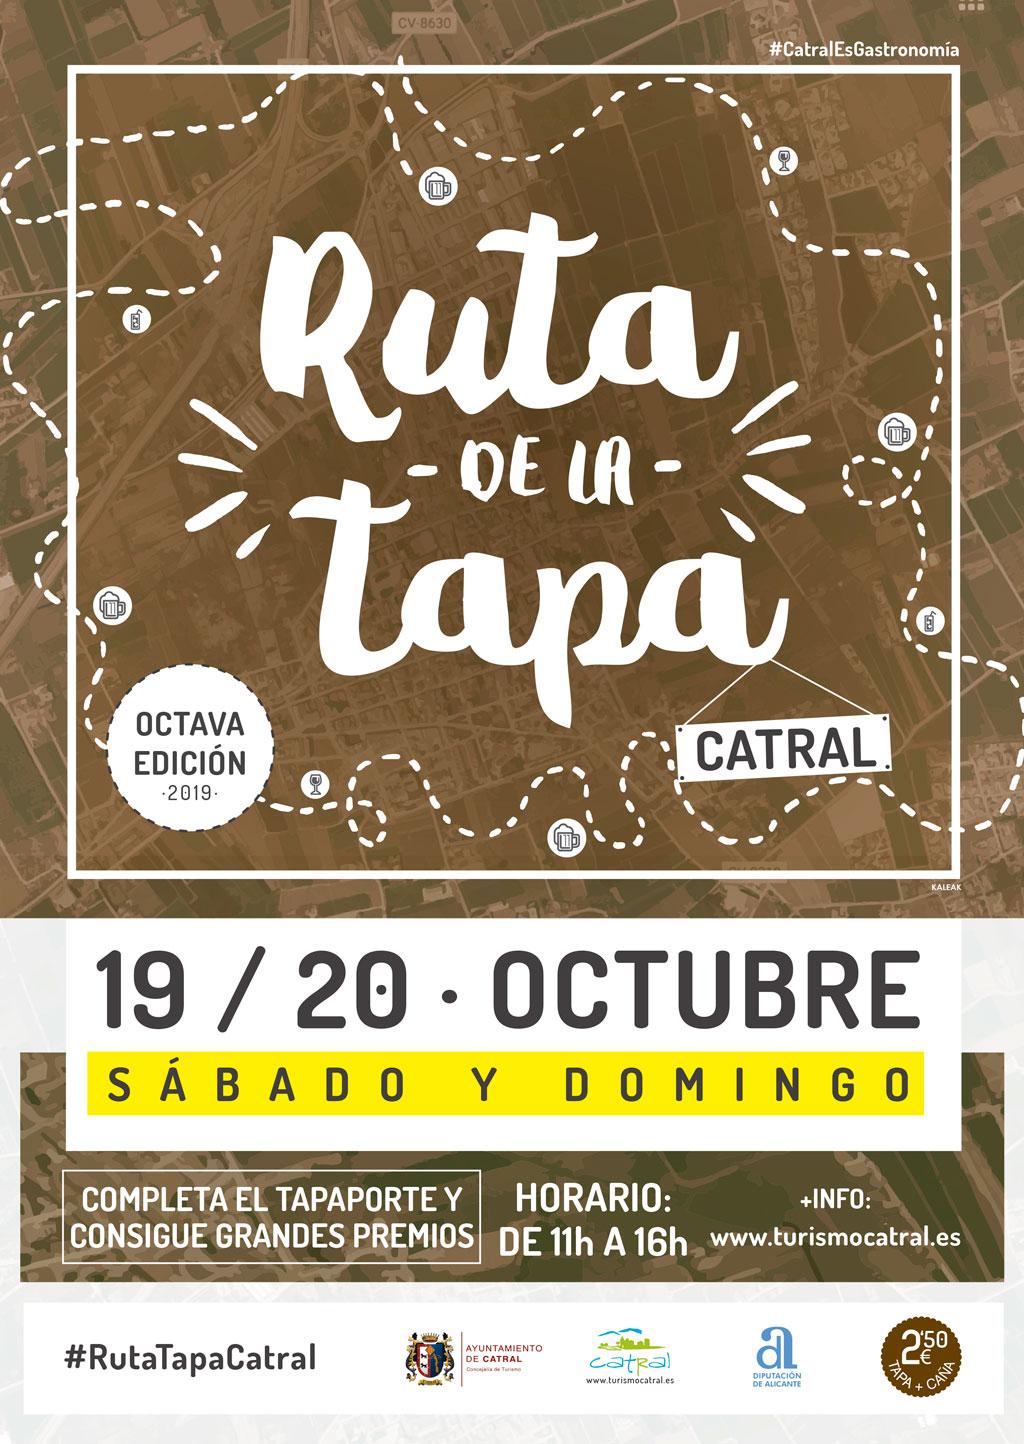 RUTA-TAPA-CATRAL-2019_